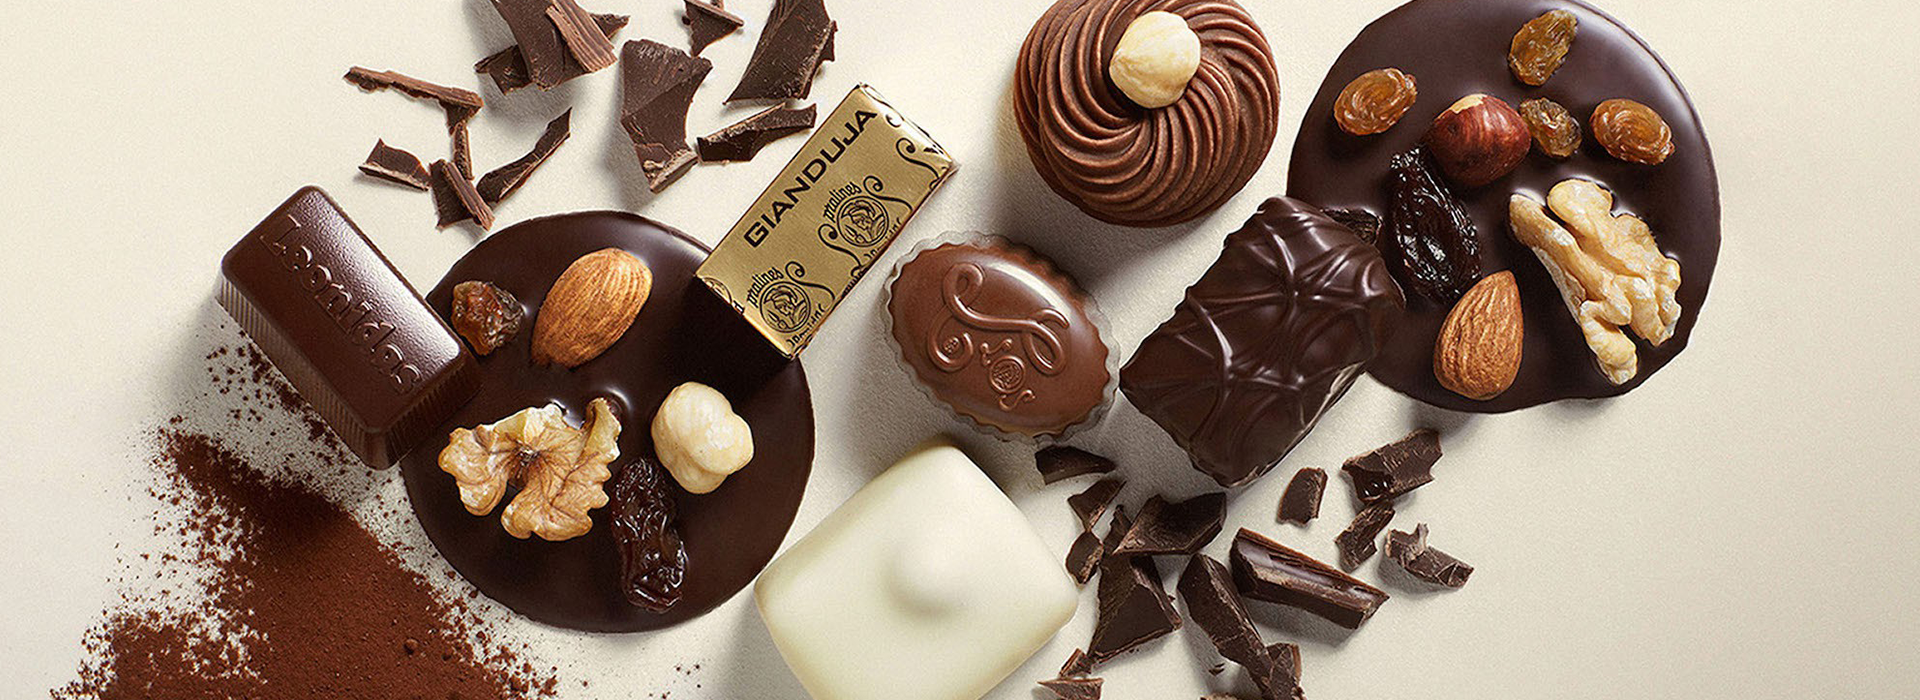 Assortiment pralines et chocolats Leonidas